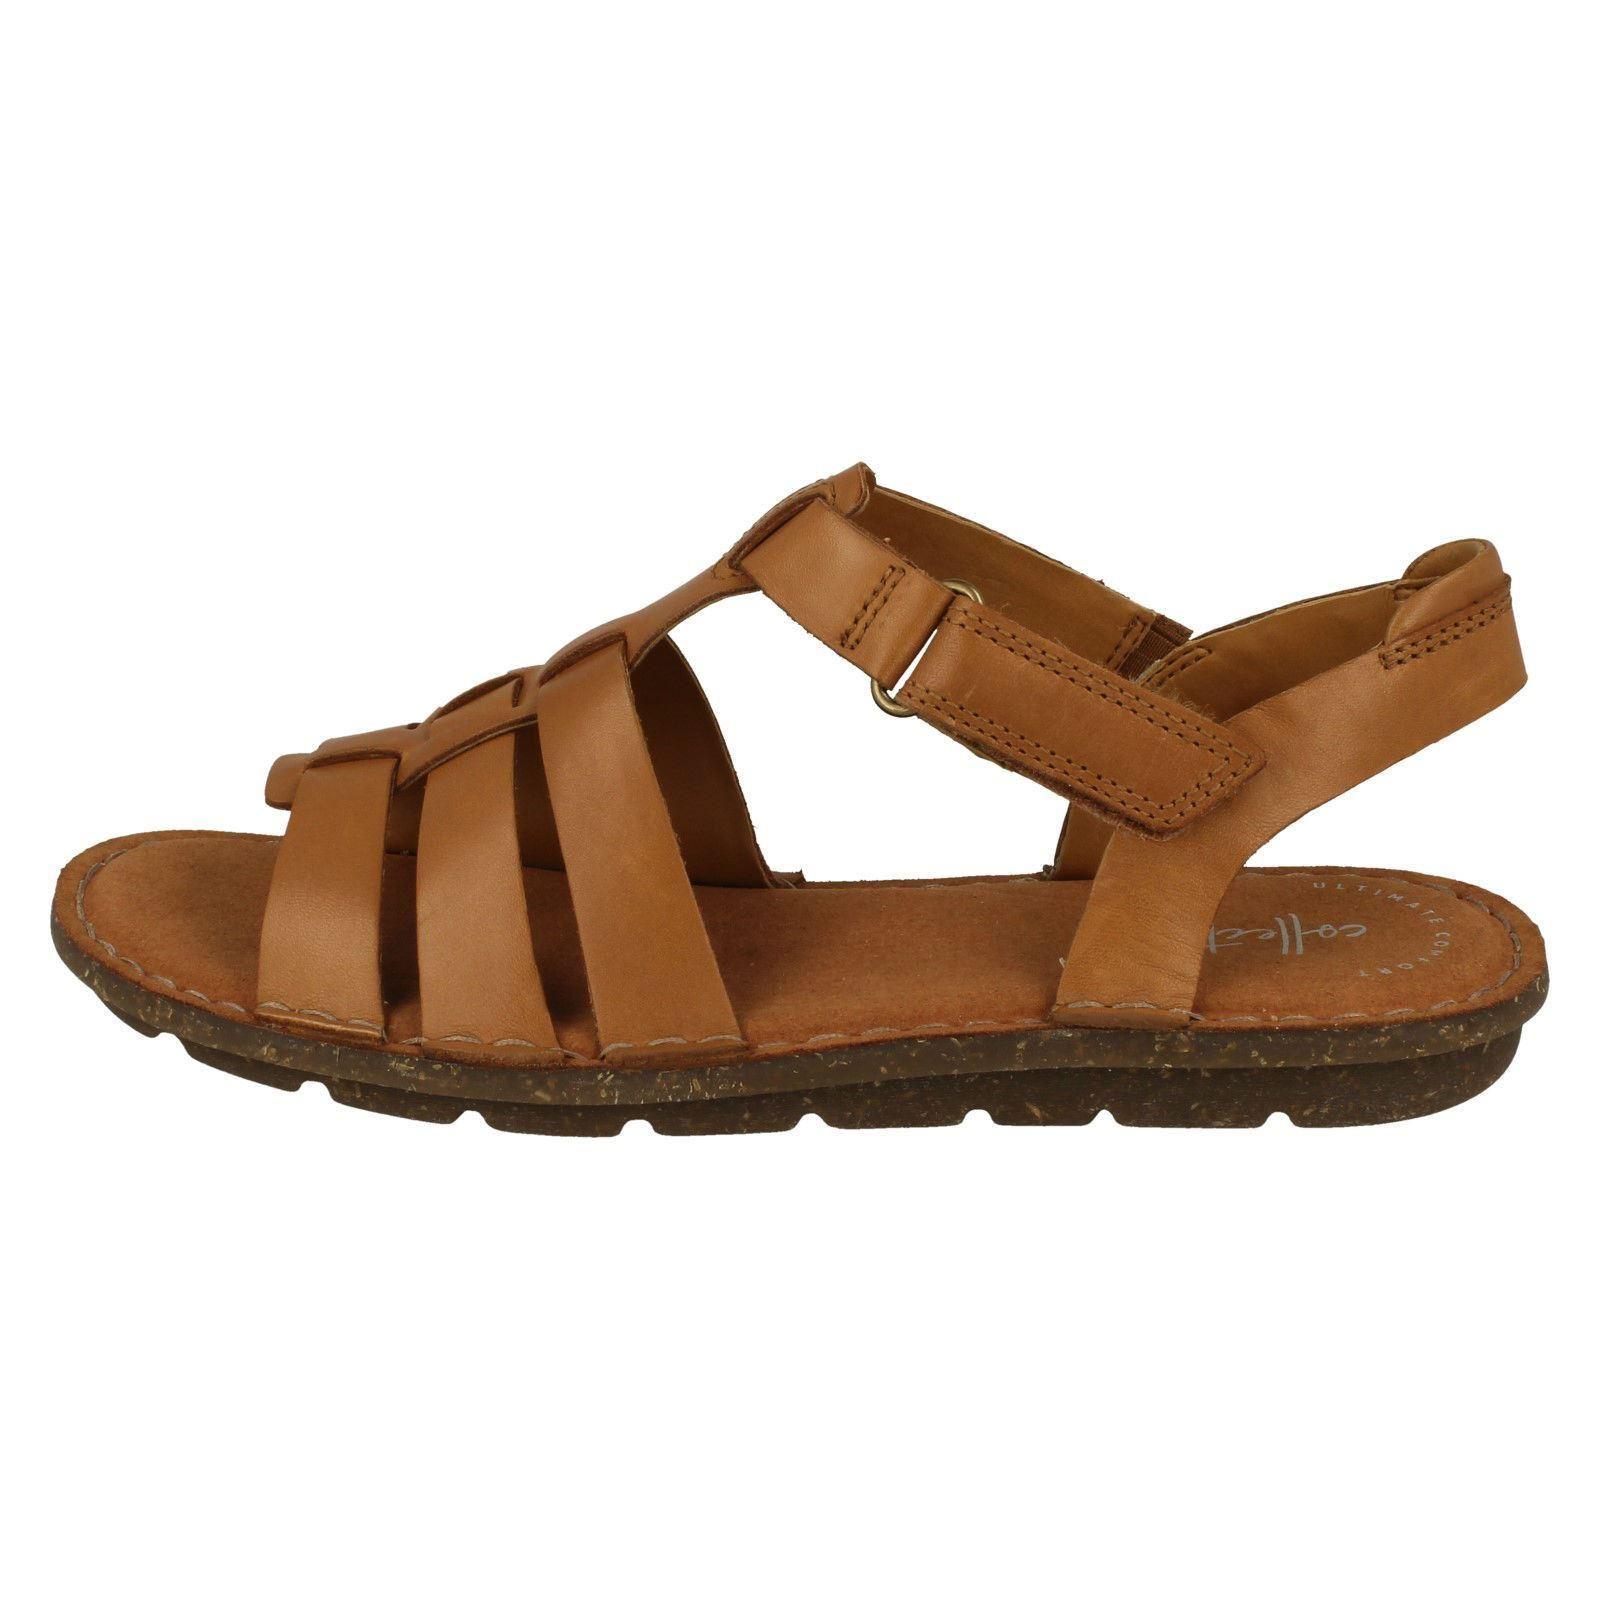 Ash Chaussures Miracle Sandales en Cuir Marron Femme 37